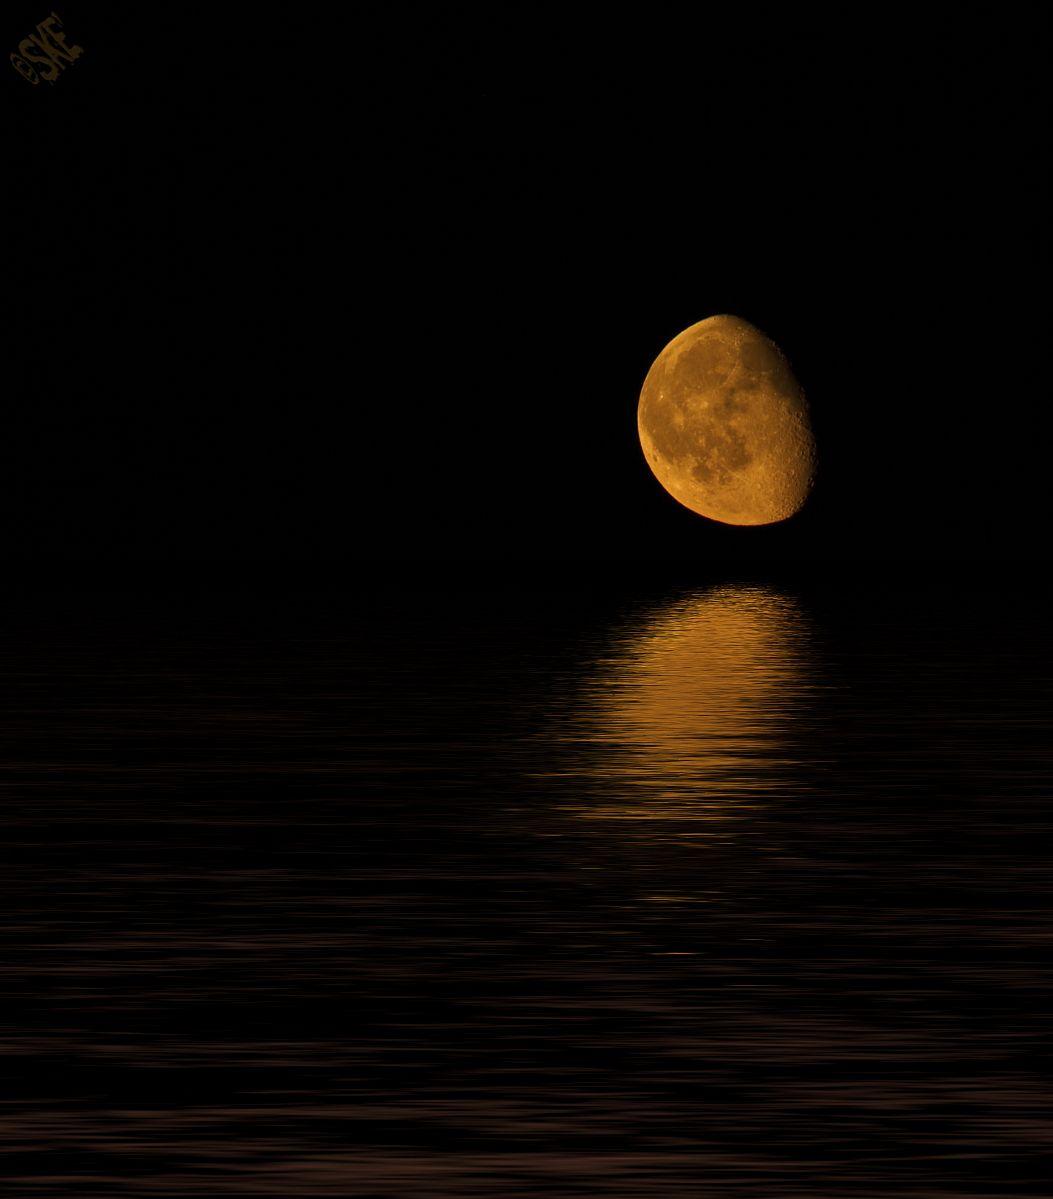 Alle Größen | il profondo pensiero della sera...... | Flickr - Fotosharing!